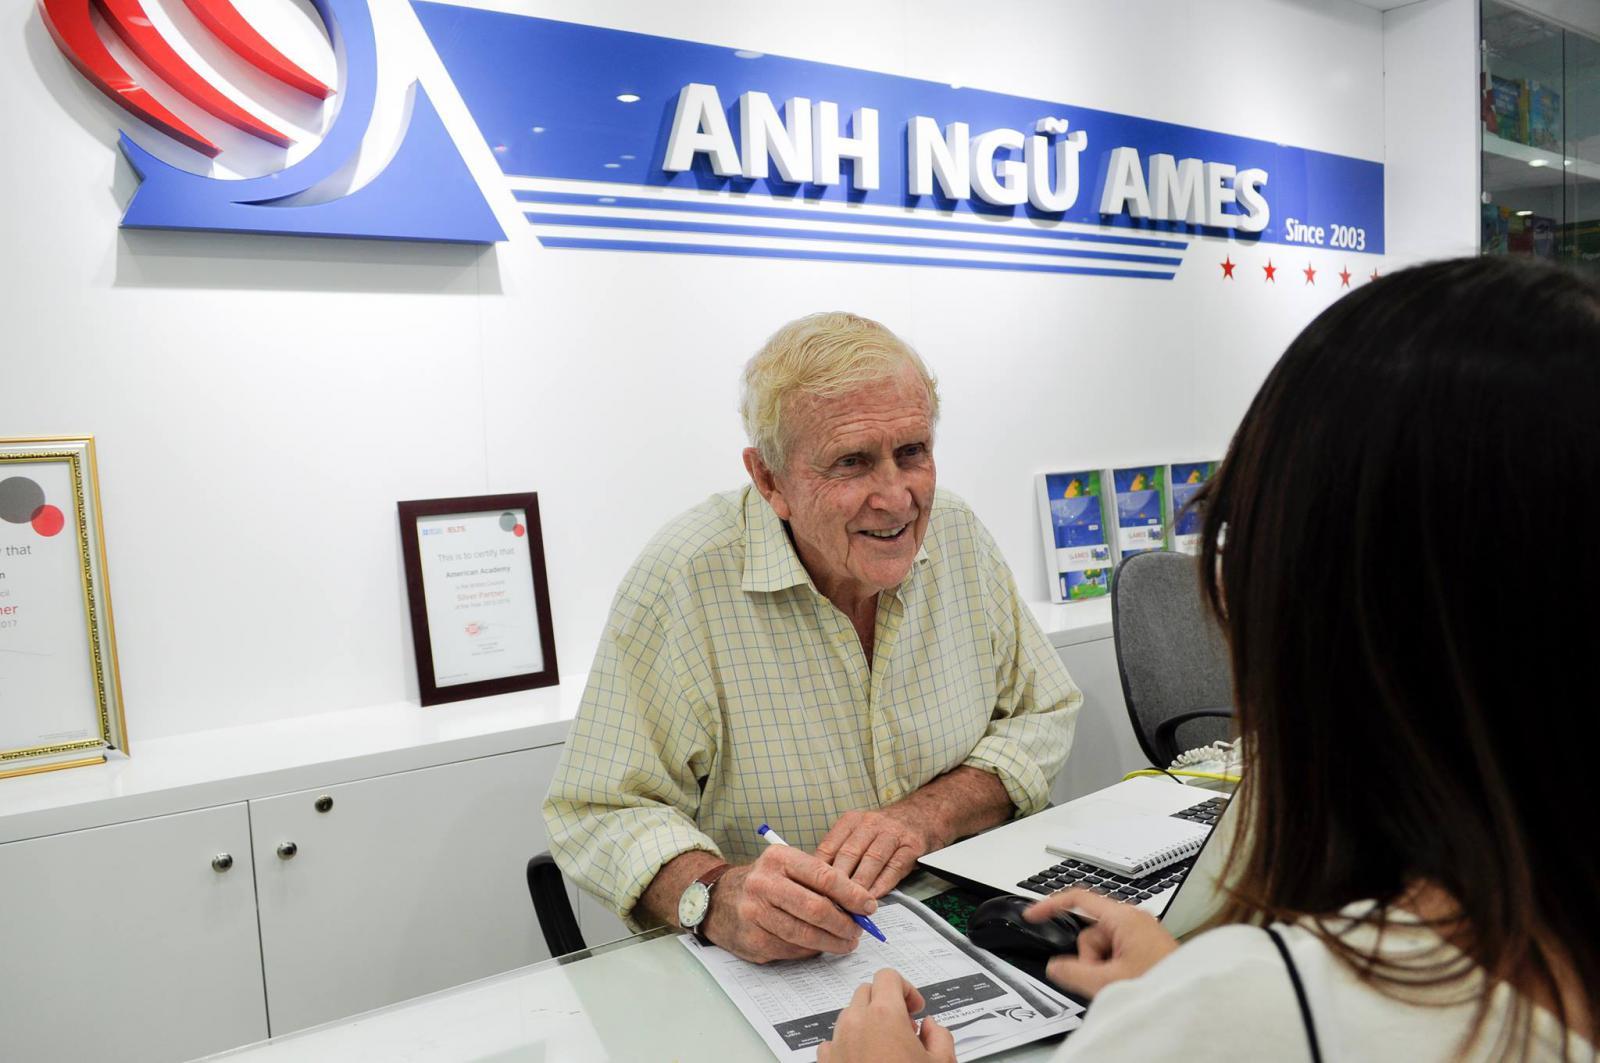 Anh_ngu_AMES